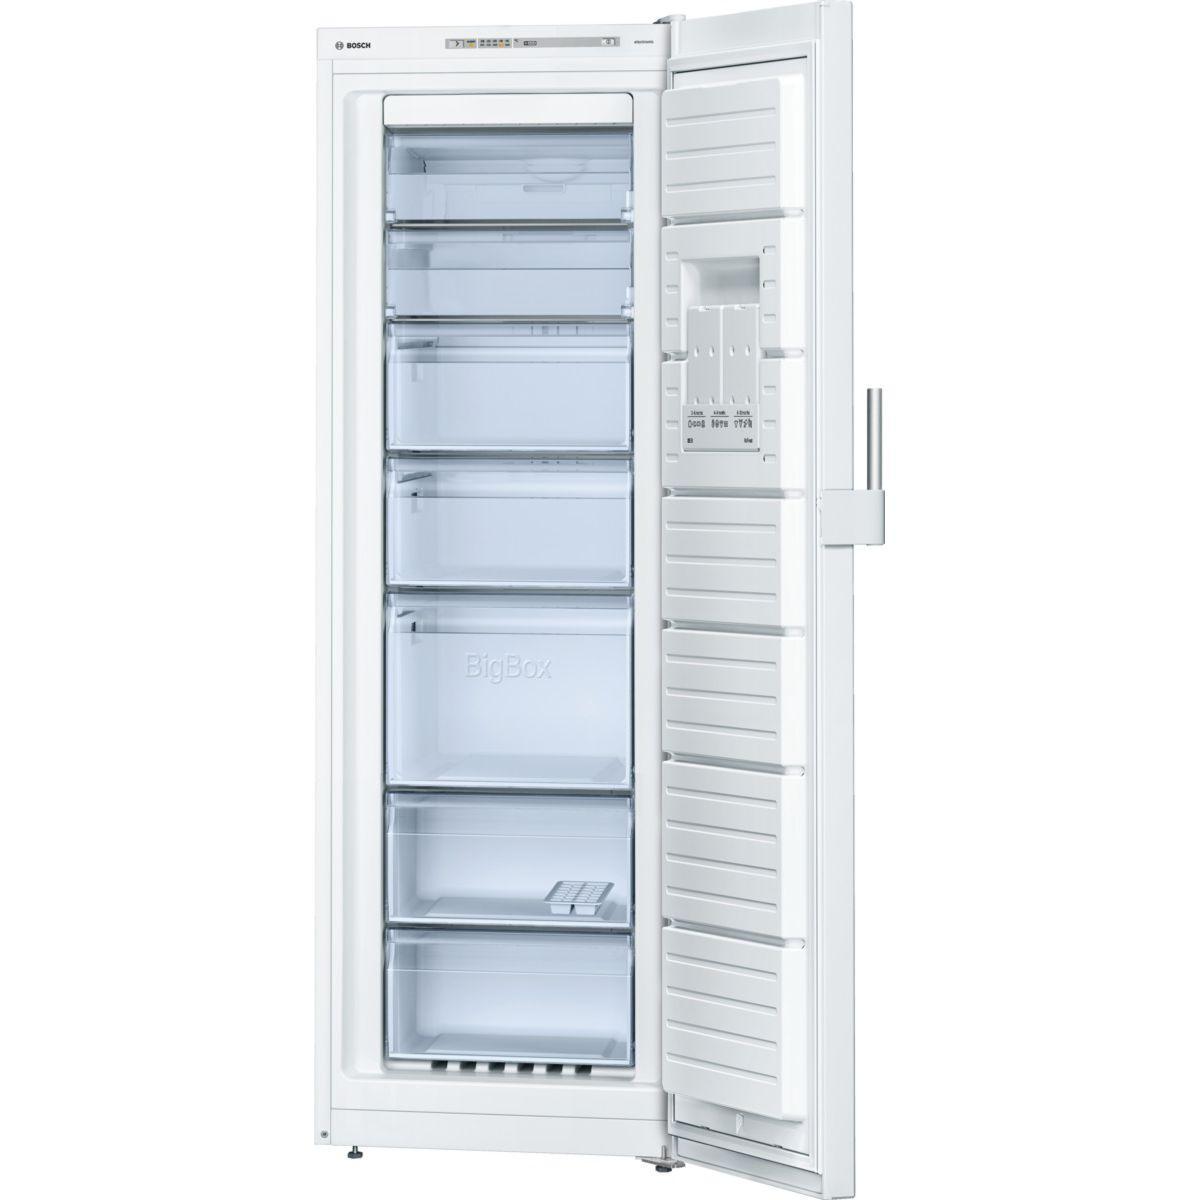 Congélateur armoire si bosch gsn33cw32 - 2% de remise : code gam2 (photo)